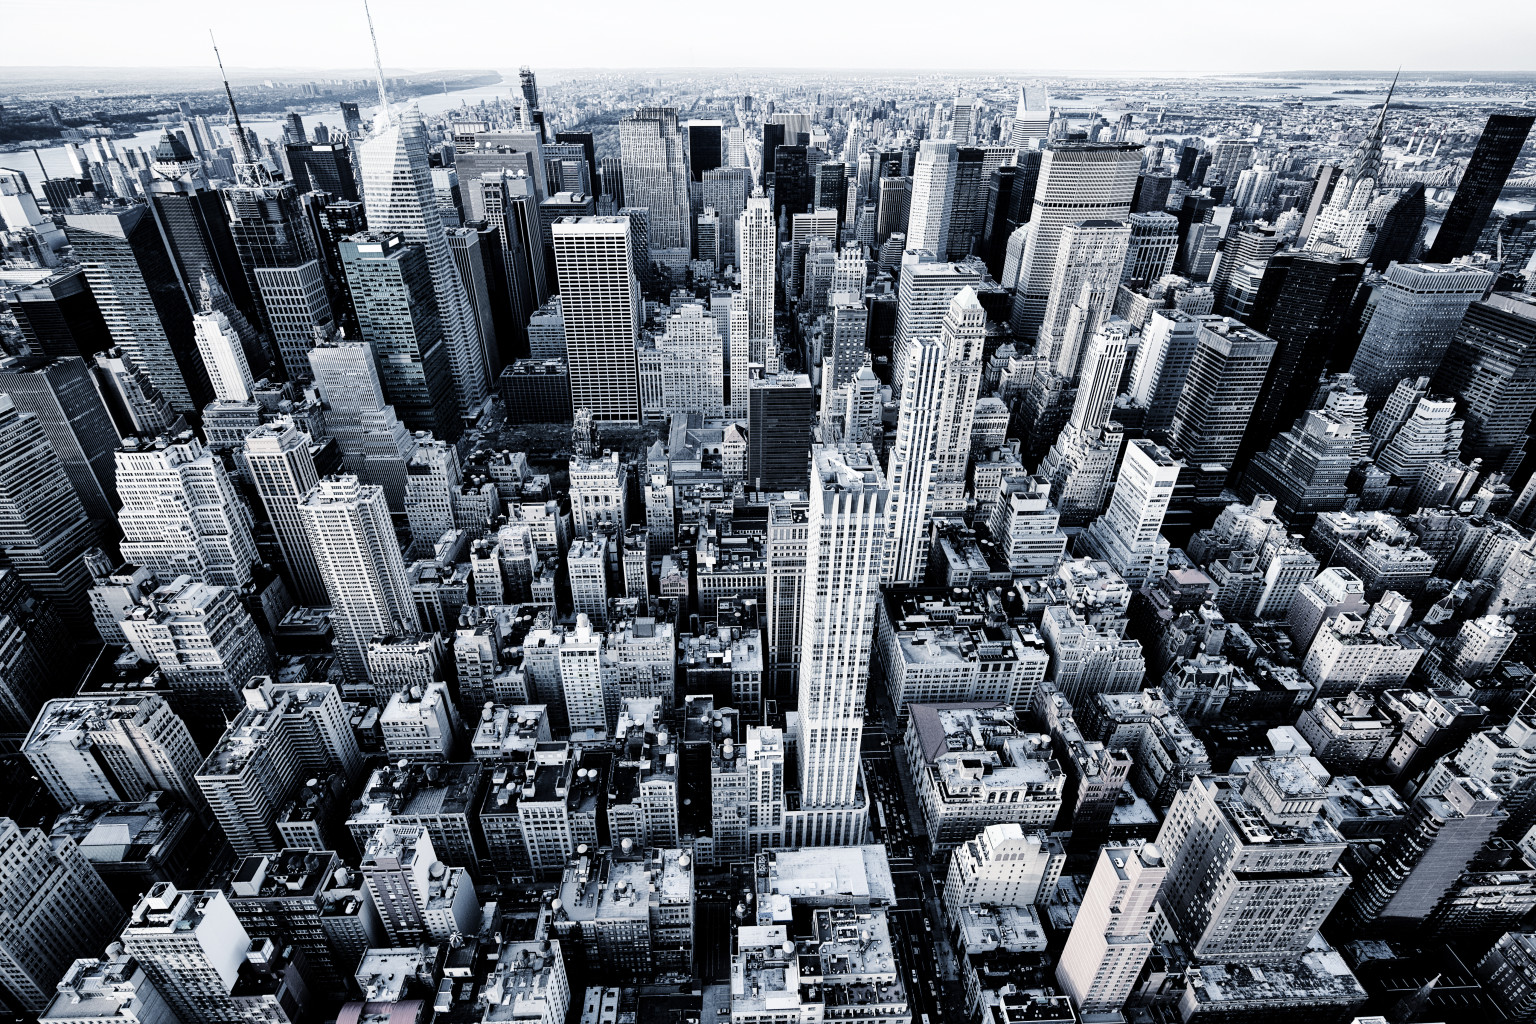 New York New York What A Progressive City Looks Like